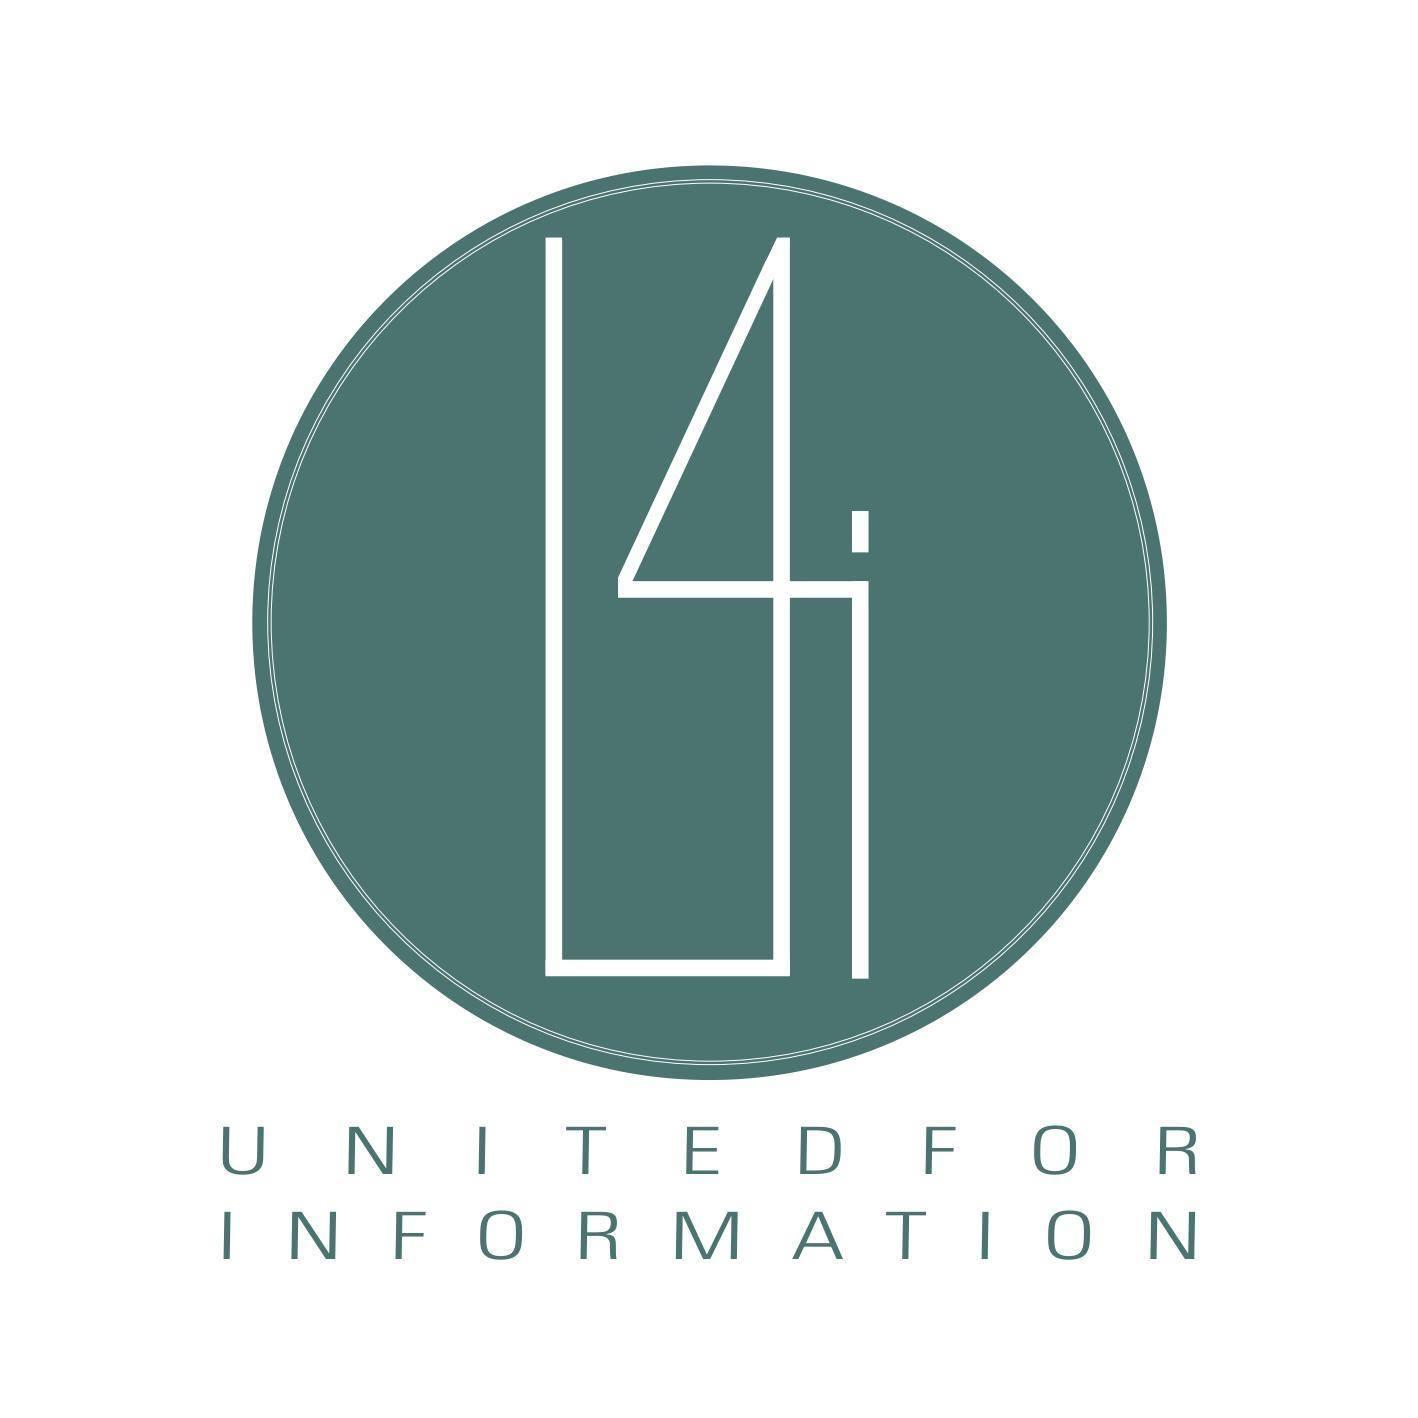 United4Information